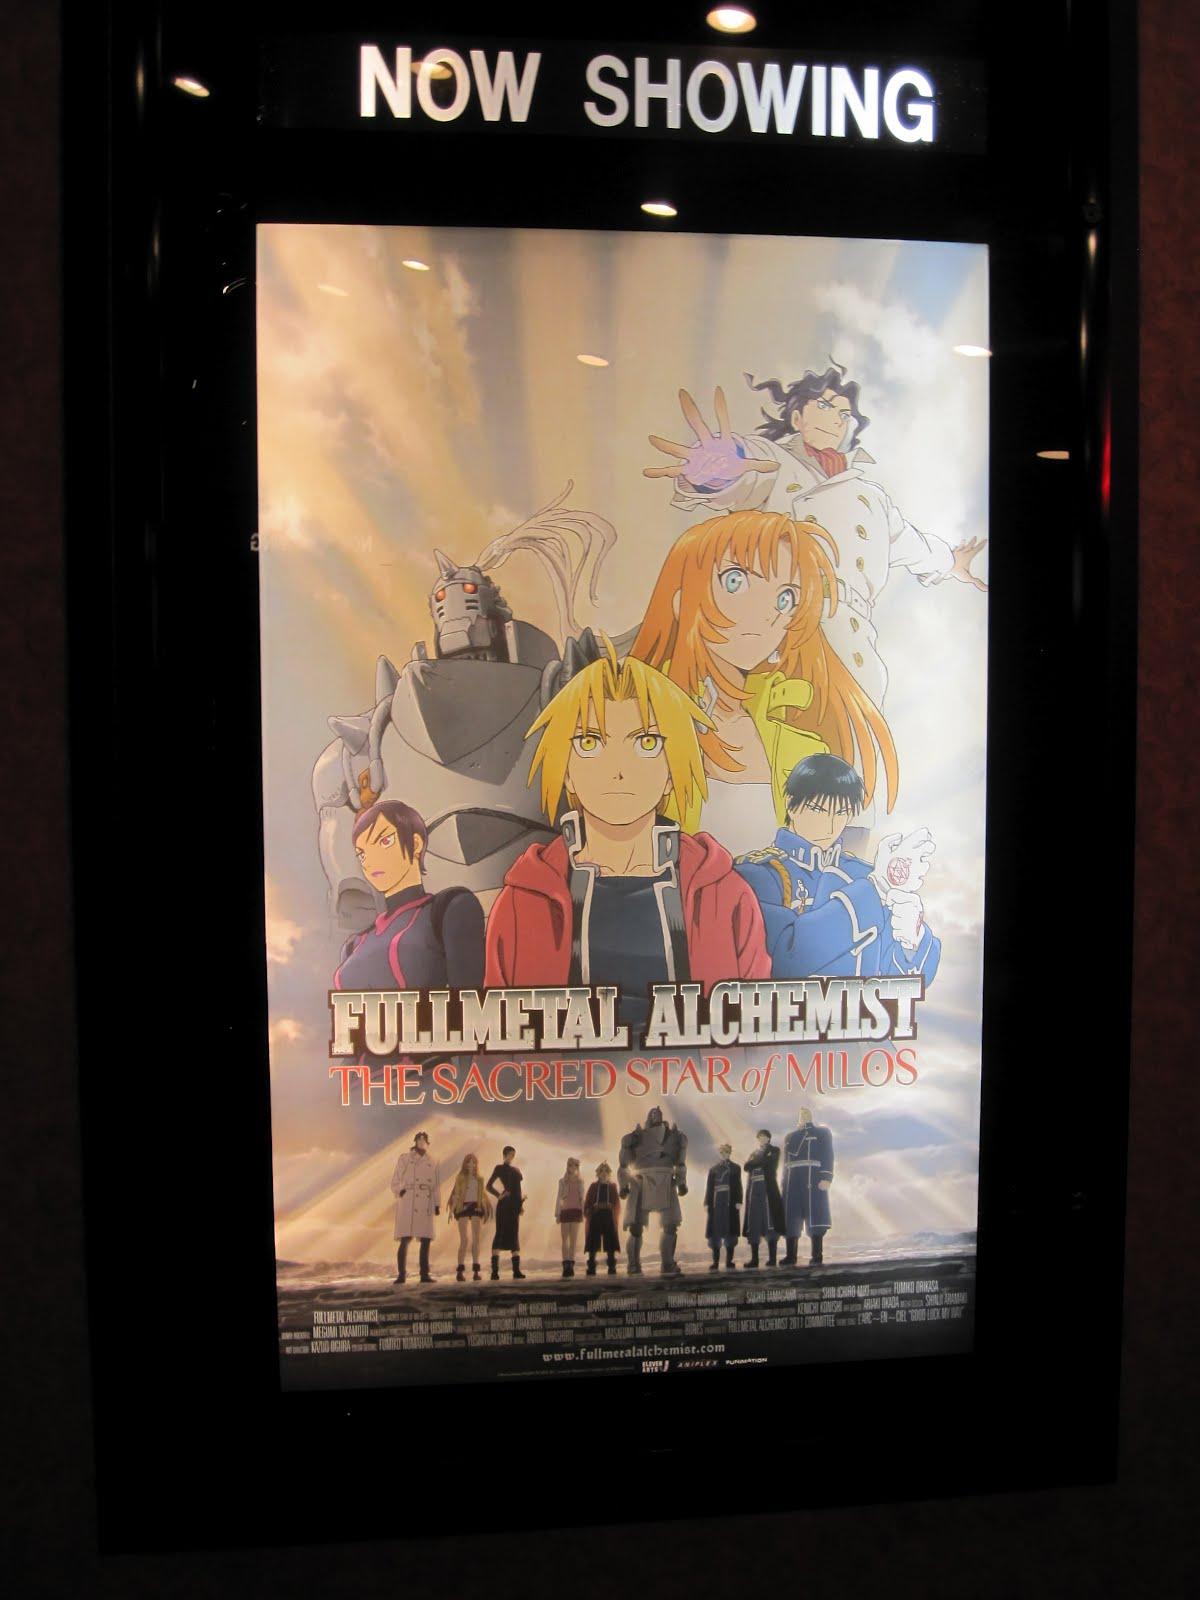 Symposium For Geek: Fullmetal Alchemist: The Sacred Star of Milos